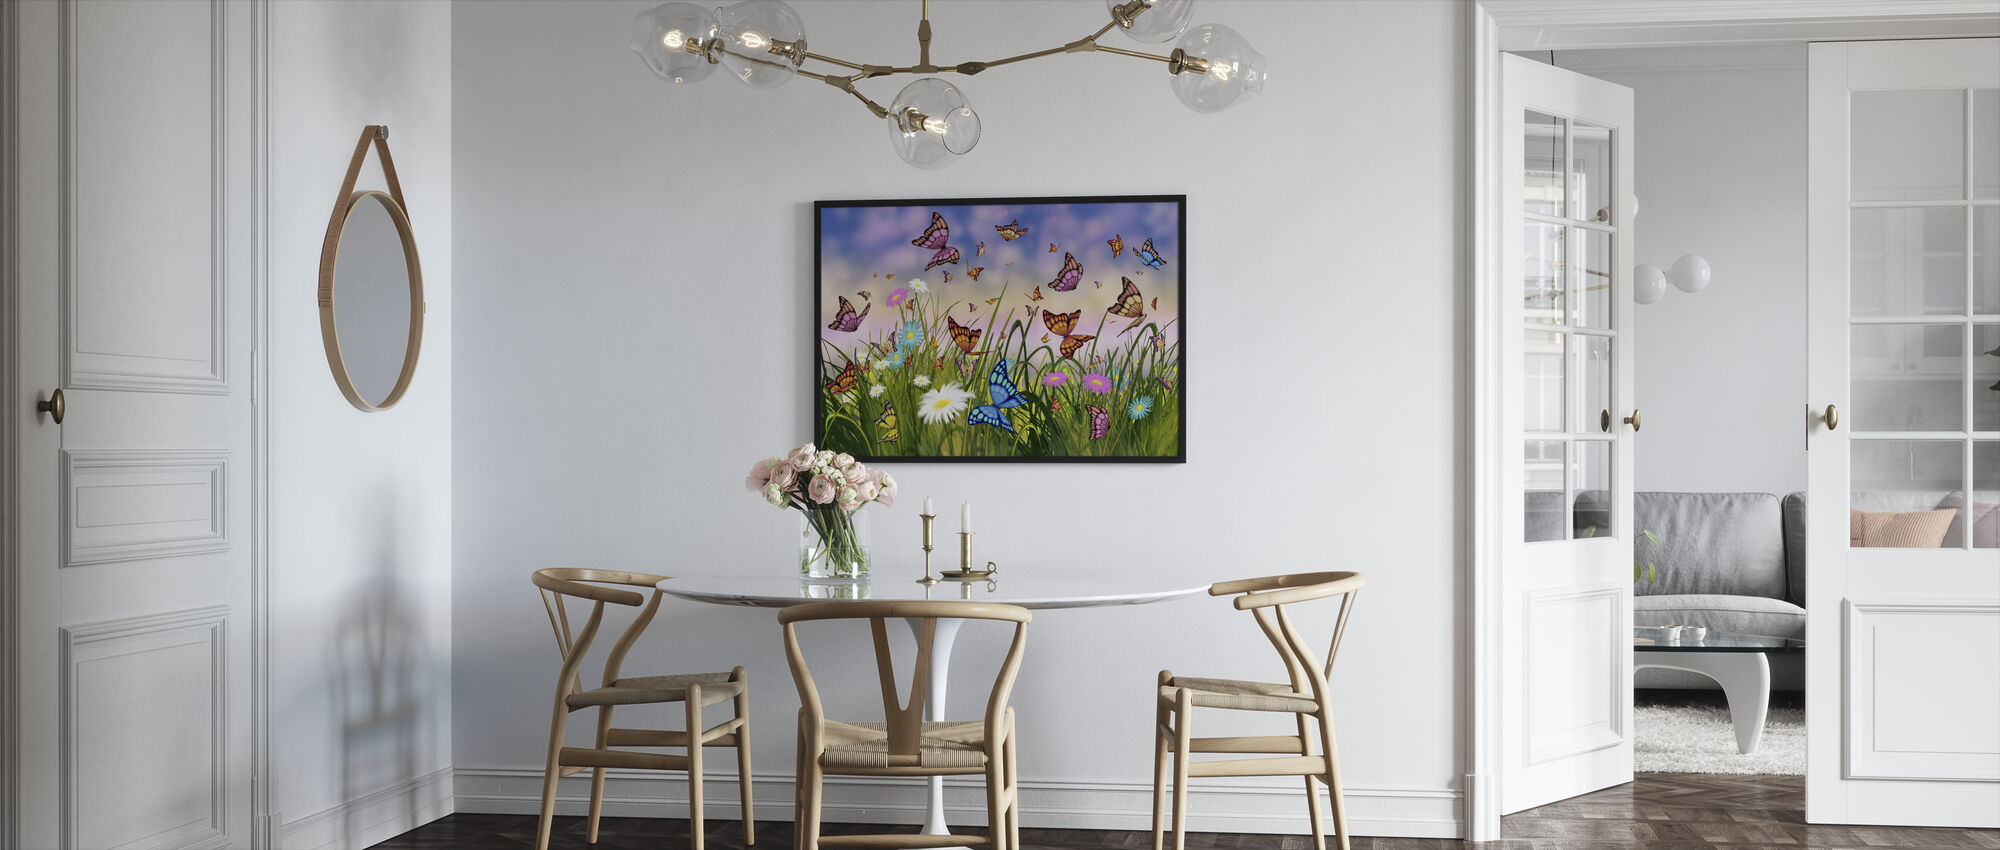 Butterfly Dreams - Framed print - Kitchen